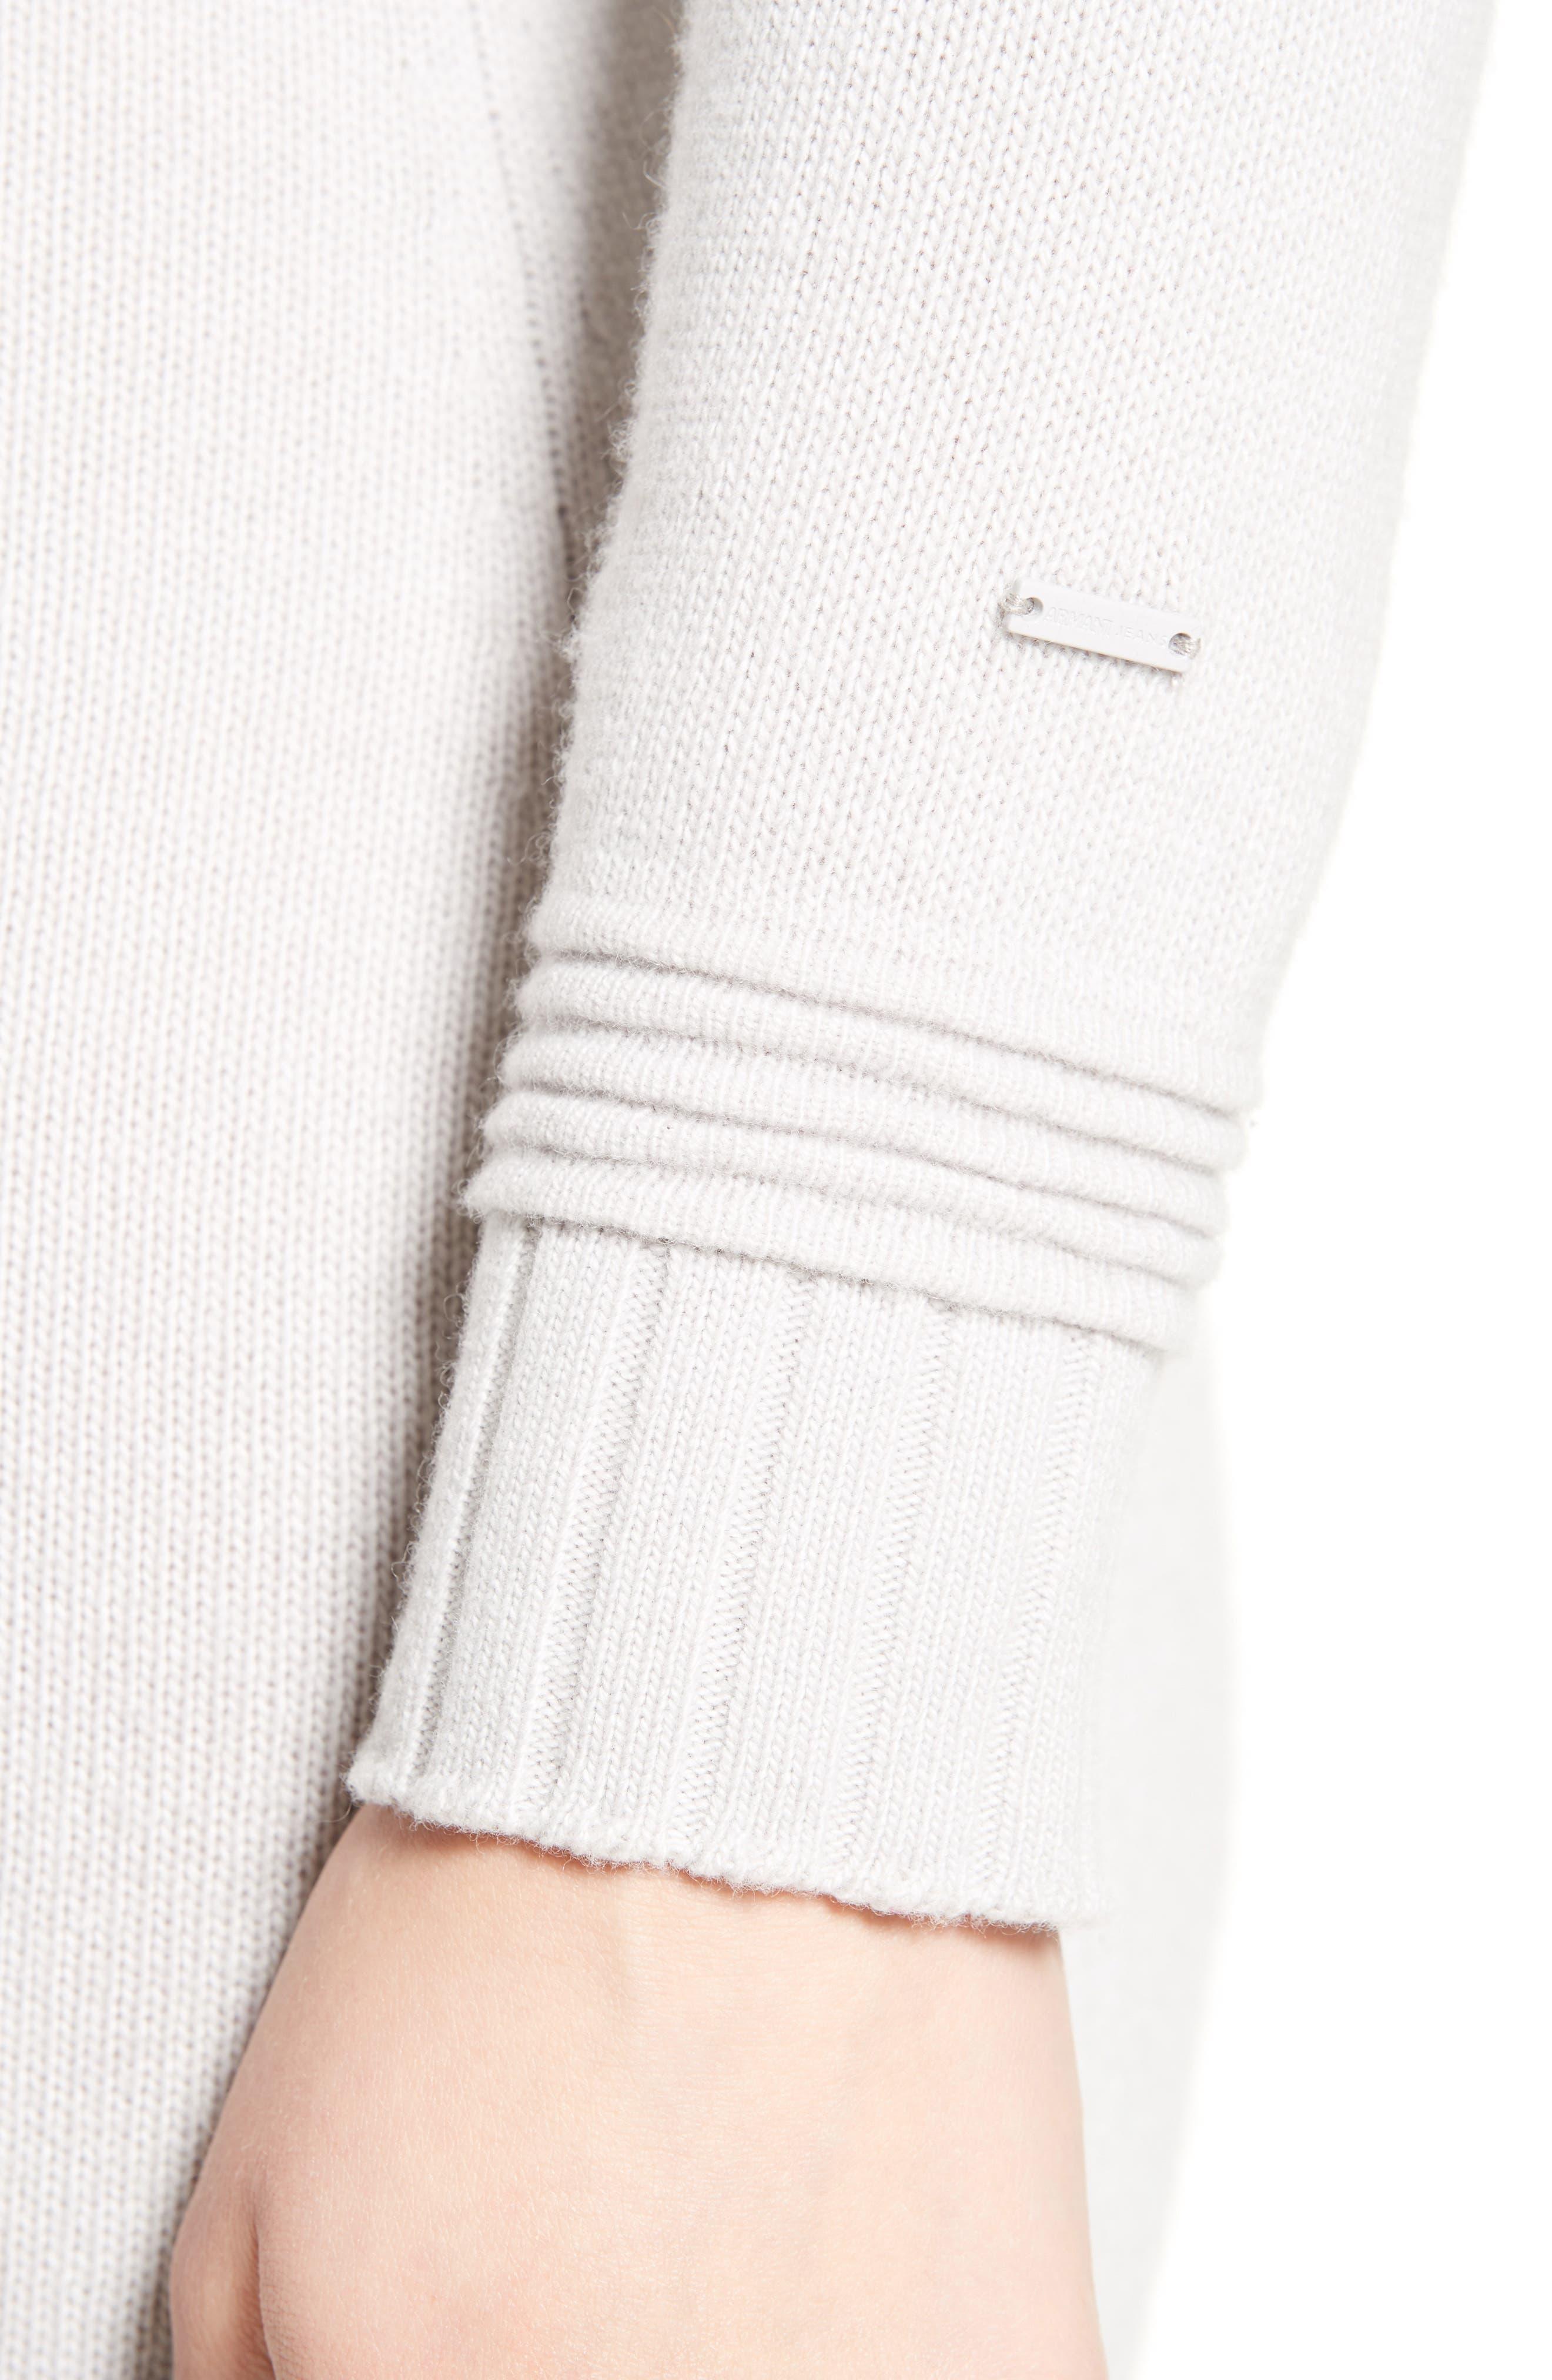 Armani Jeans Knit Sweater Dress,                             Alternate thumbnail 4, color,                             Light Grey